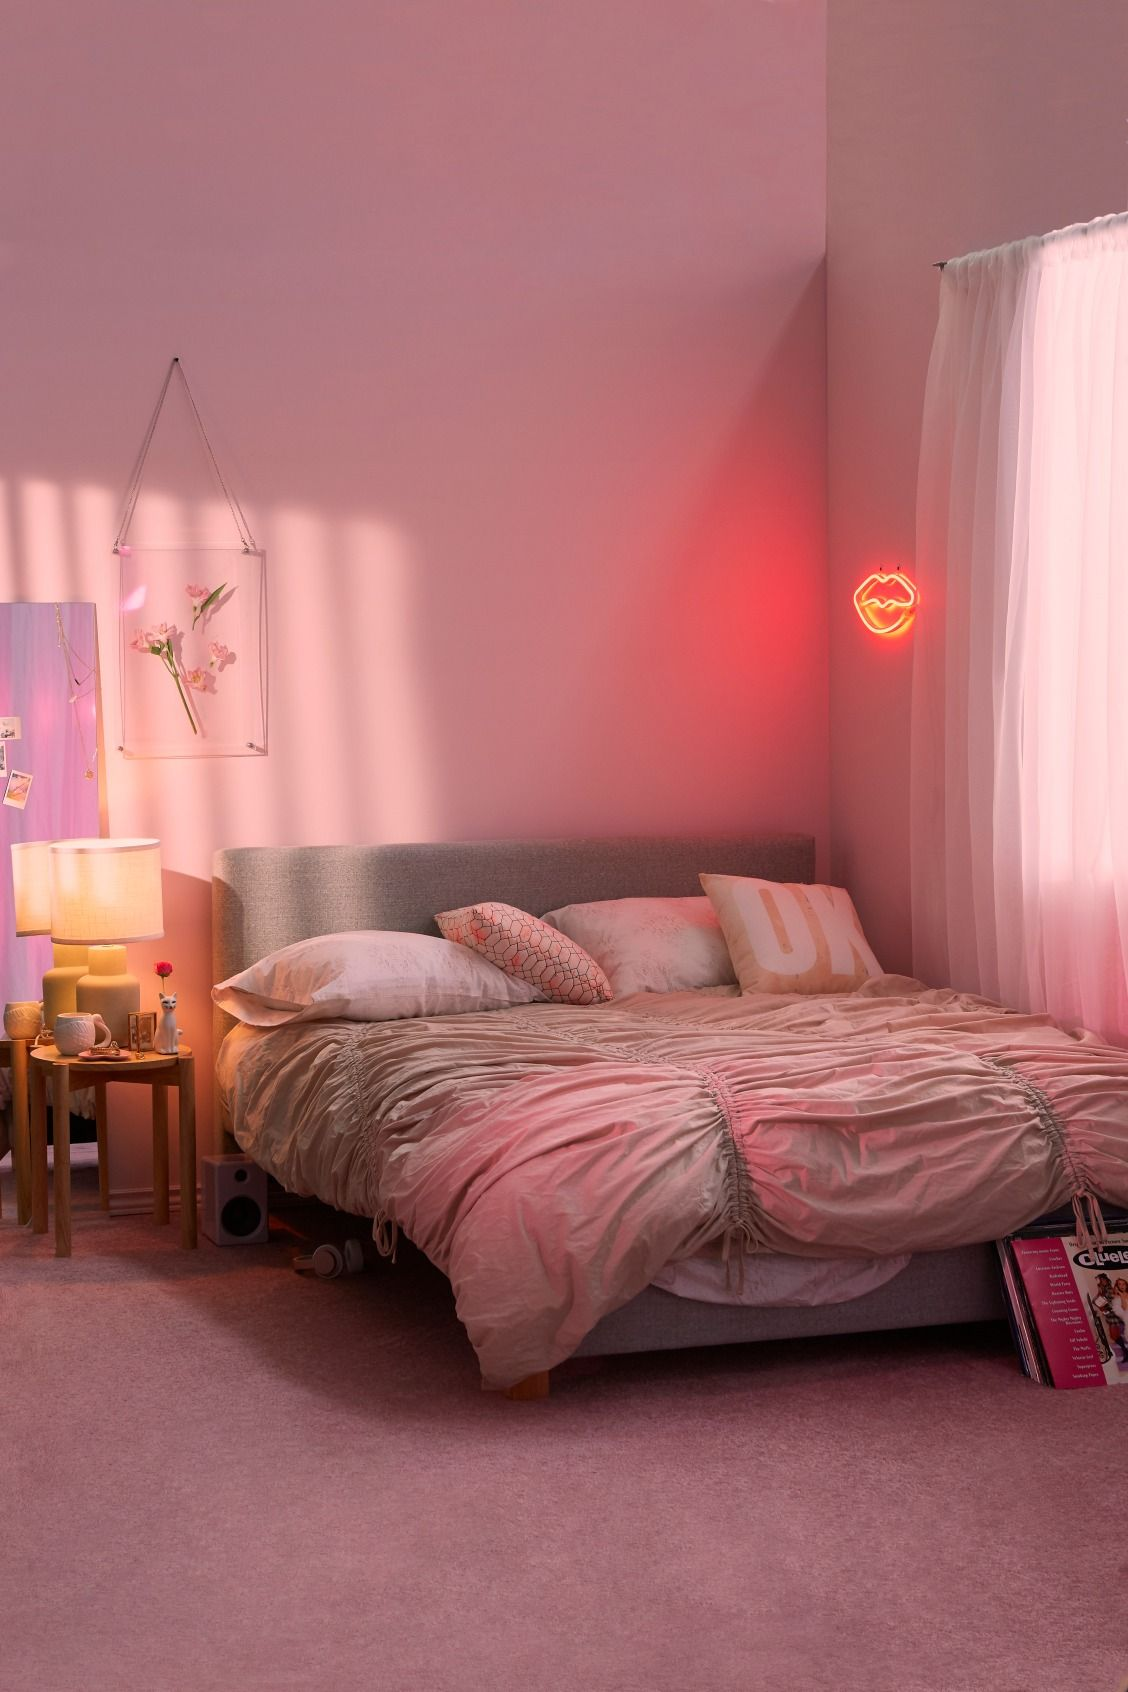 bedroom neon florida room aesthetic master condo lights celebration decor rooms light visit inspo